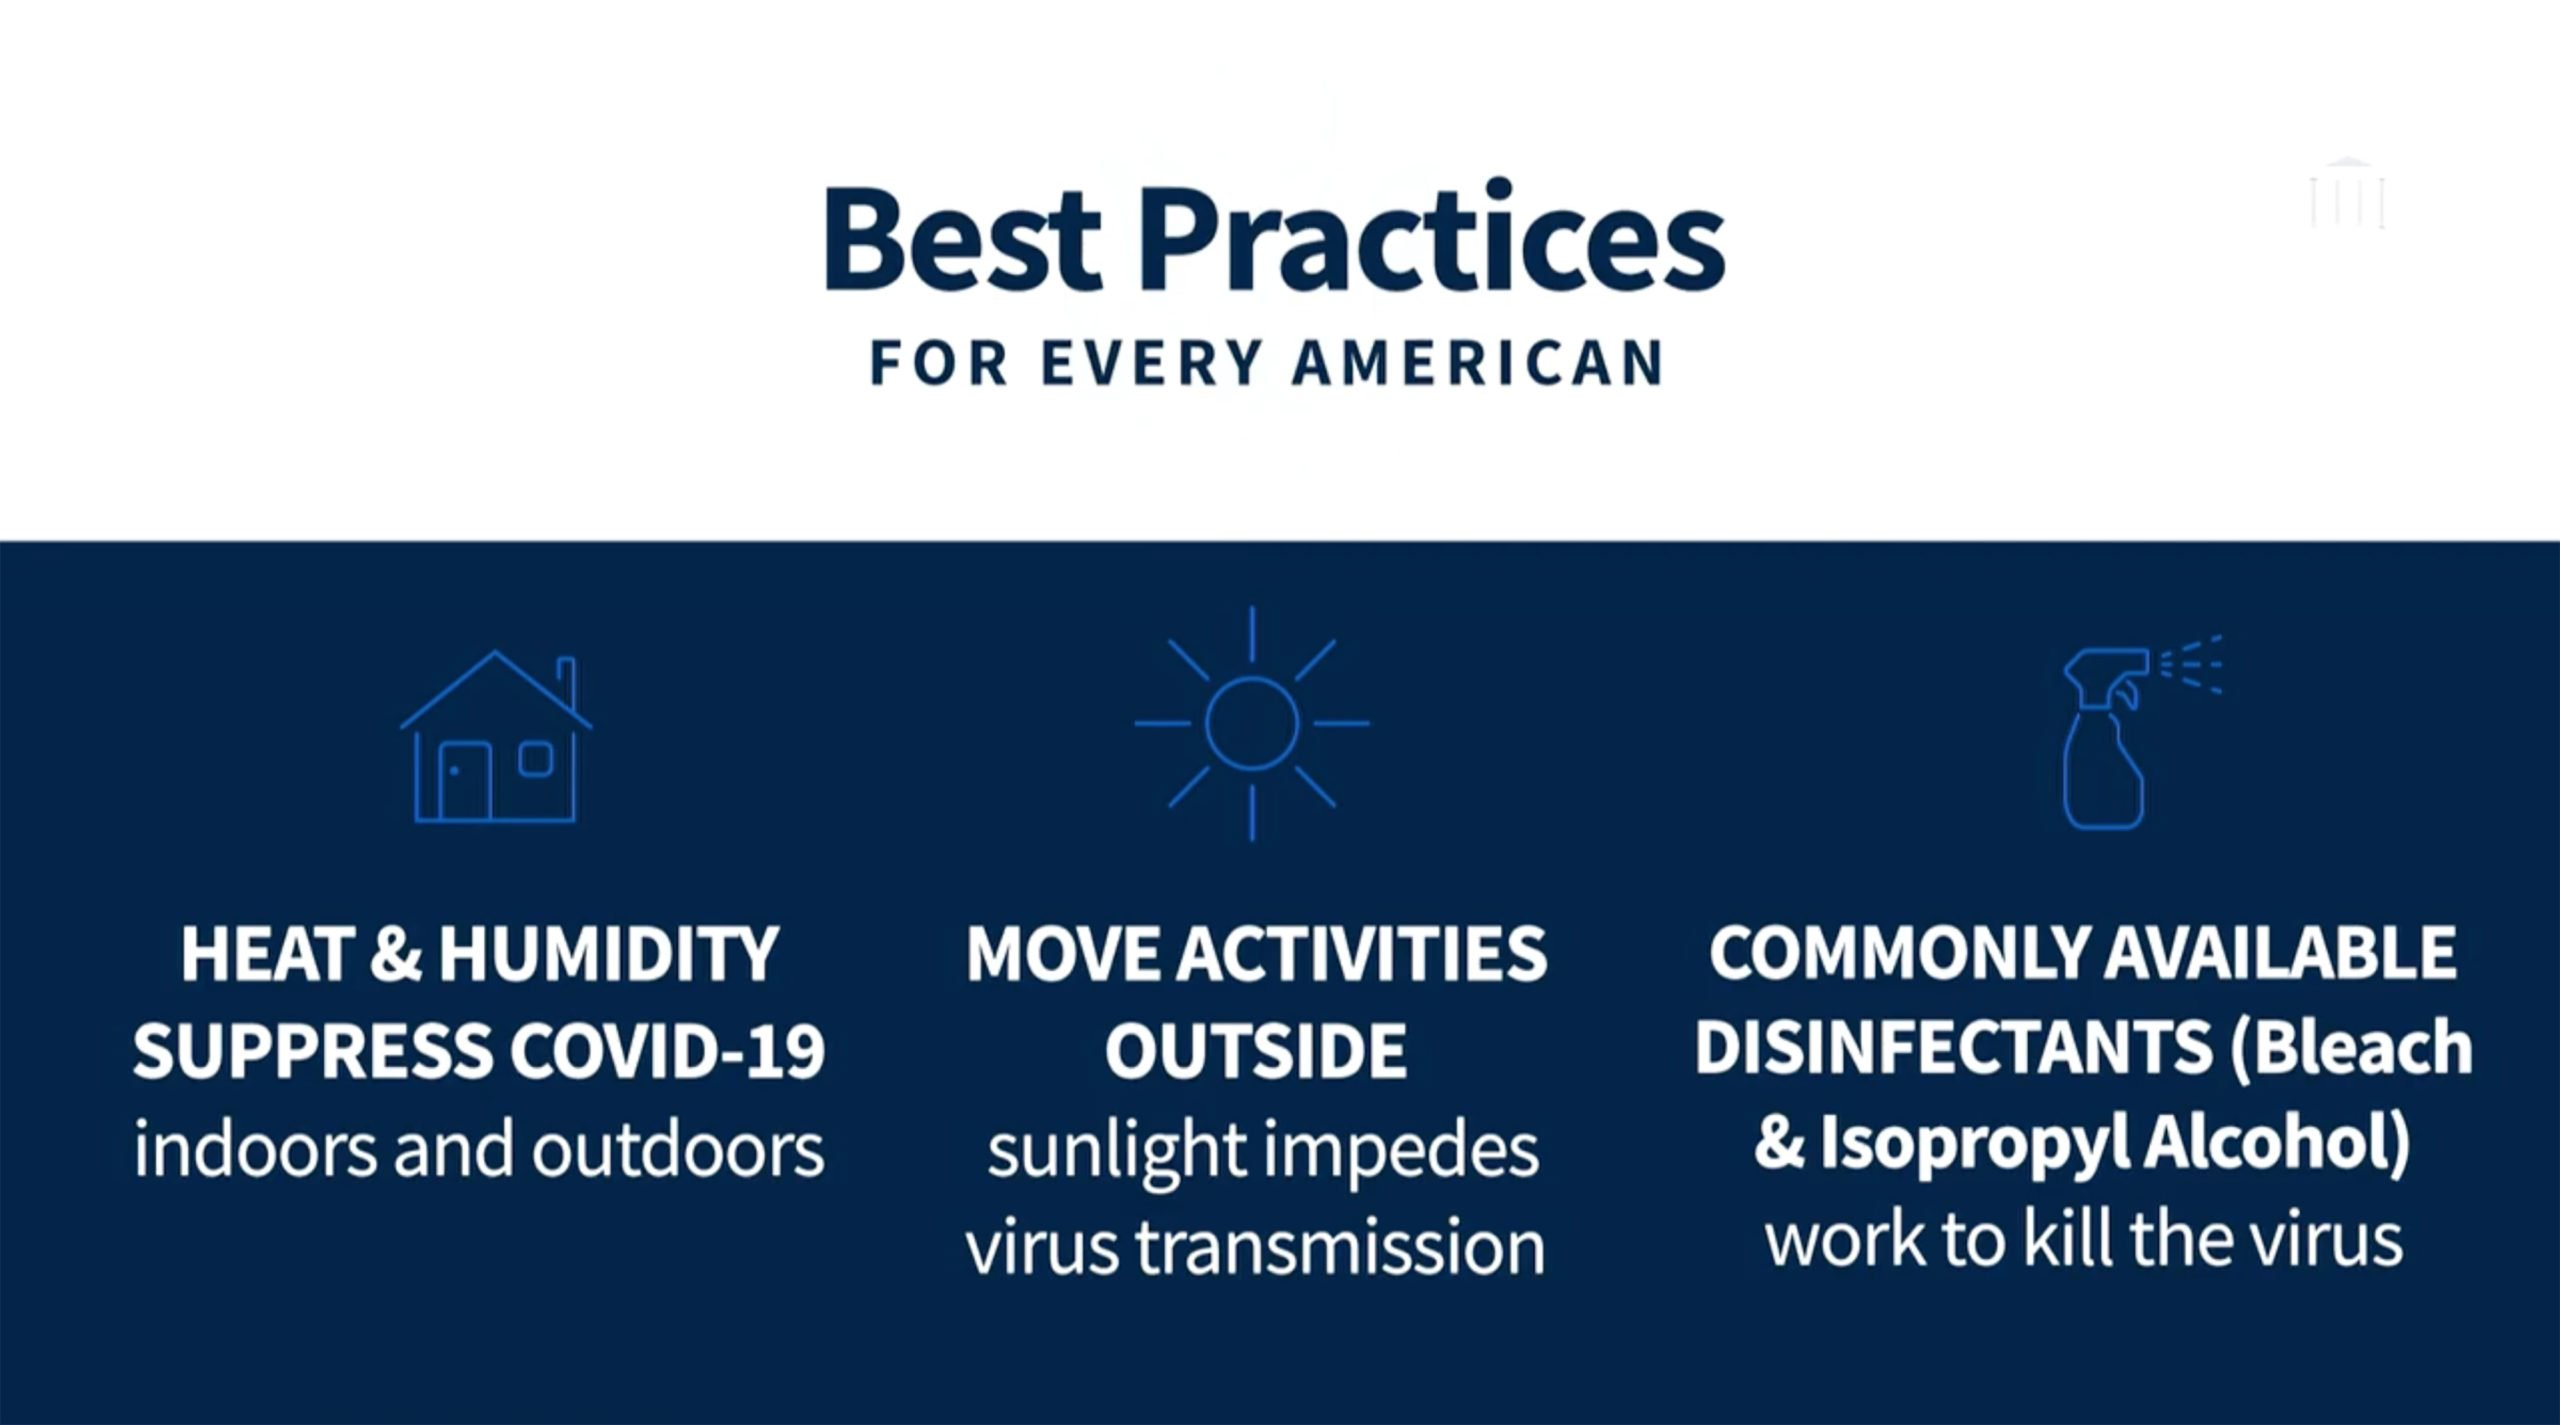 coronavirus - Usa - Trump - consigli - best practices